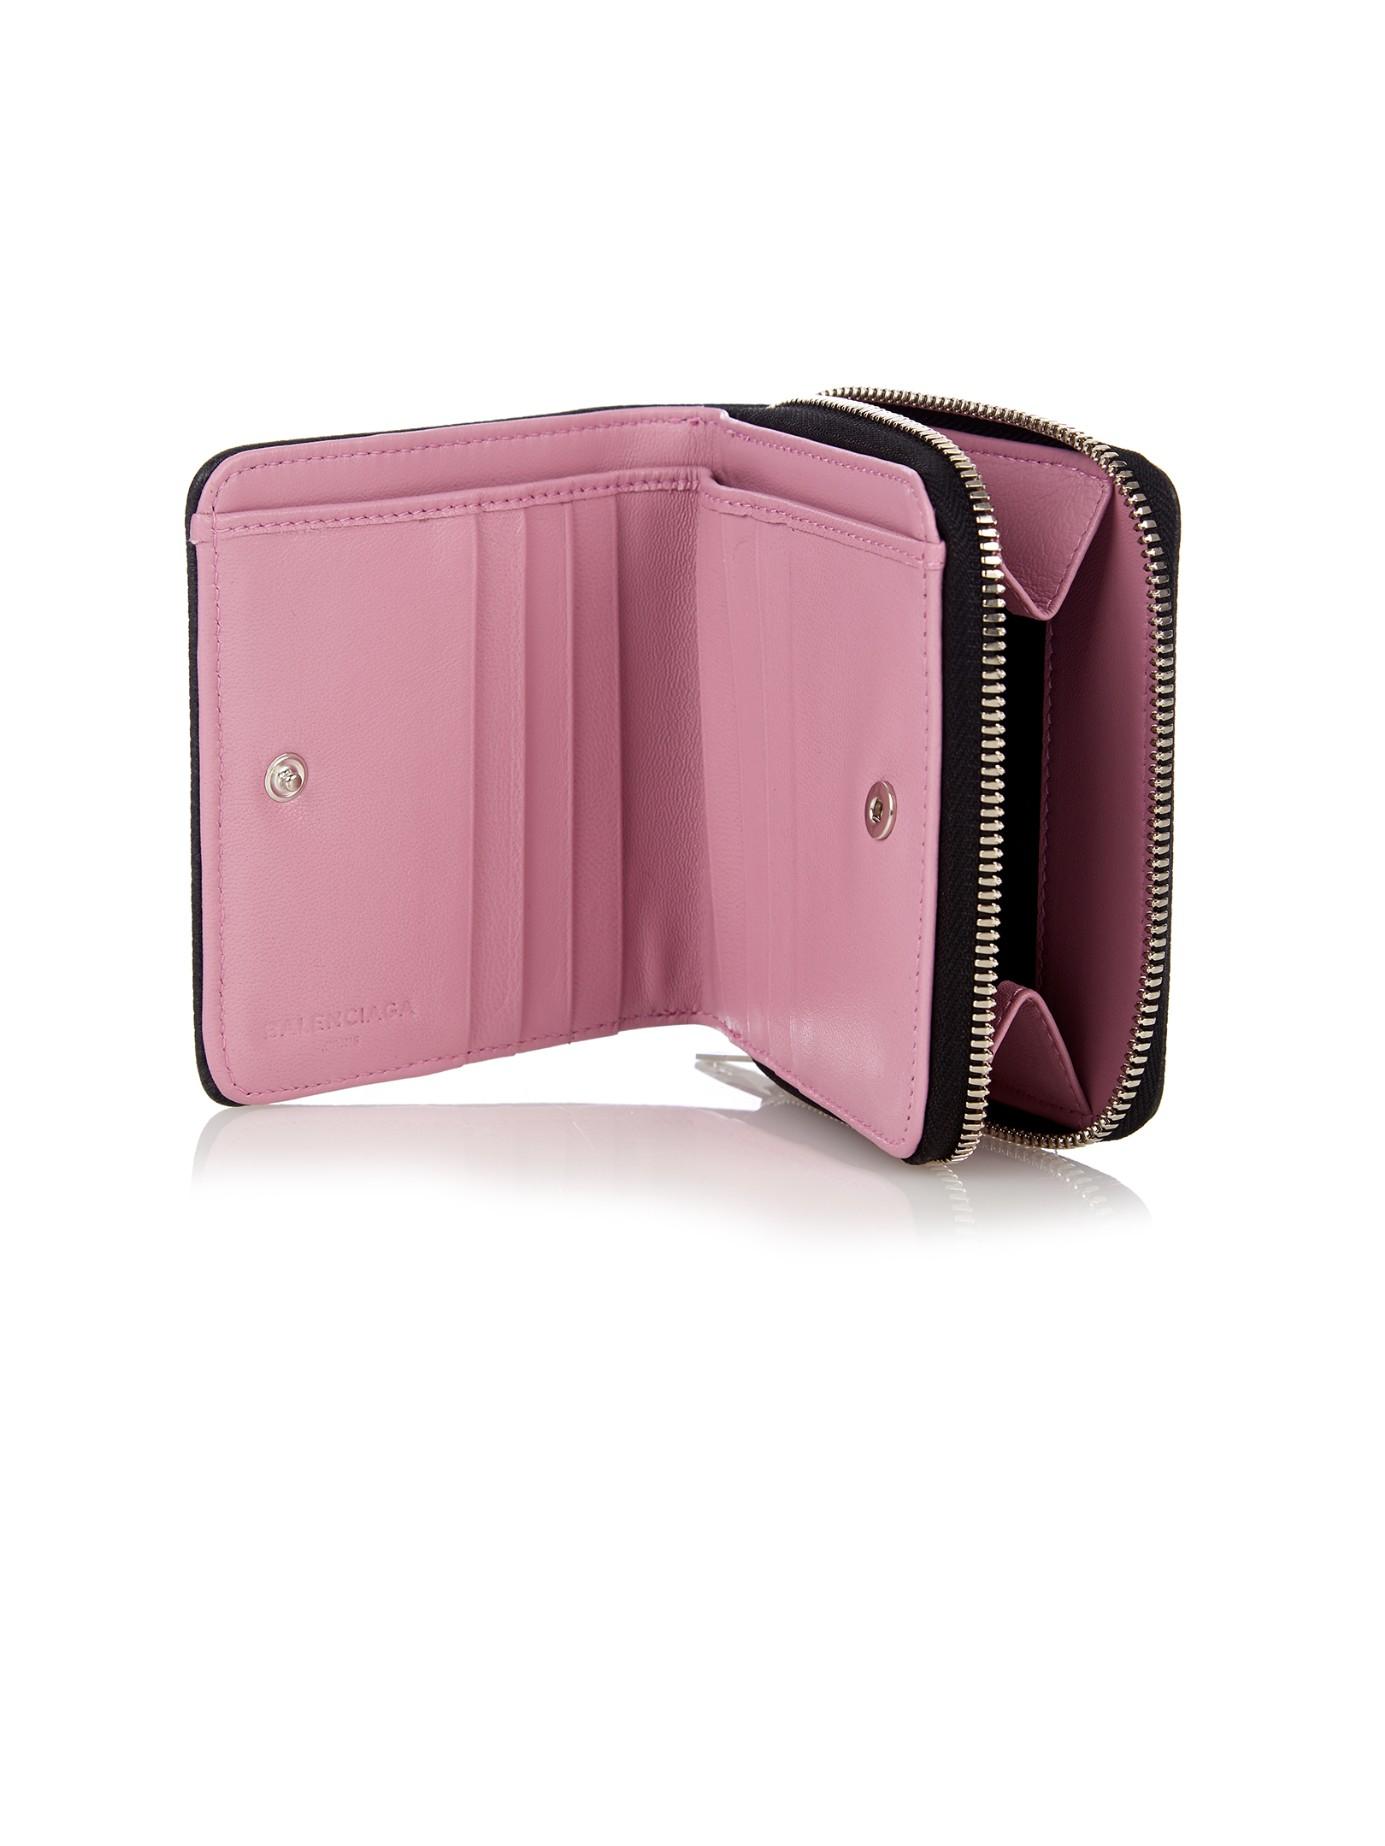 pink leather mini wallet Balenciaga poZg5fk